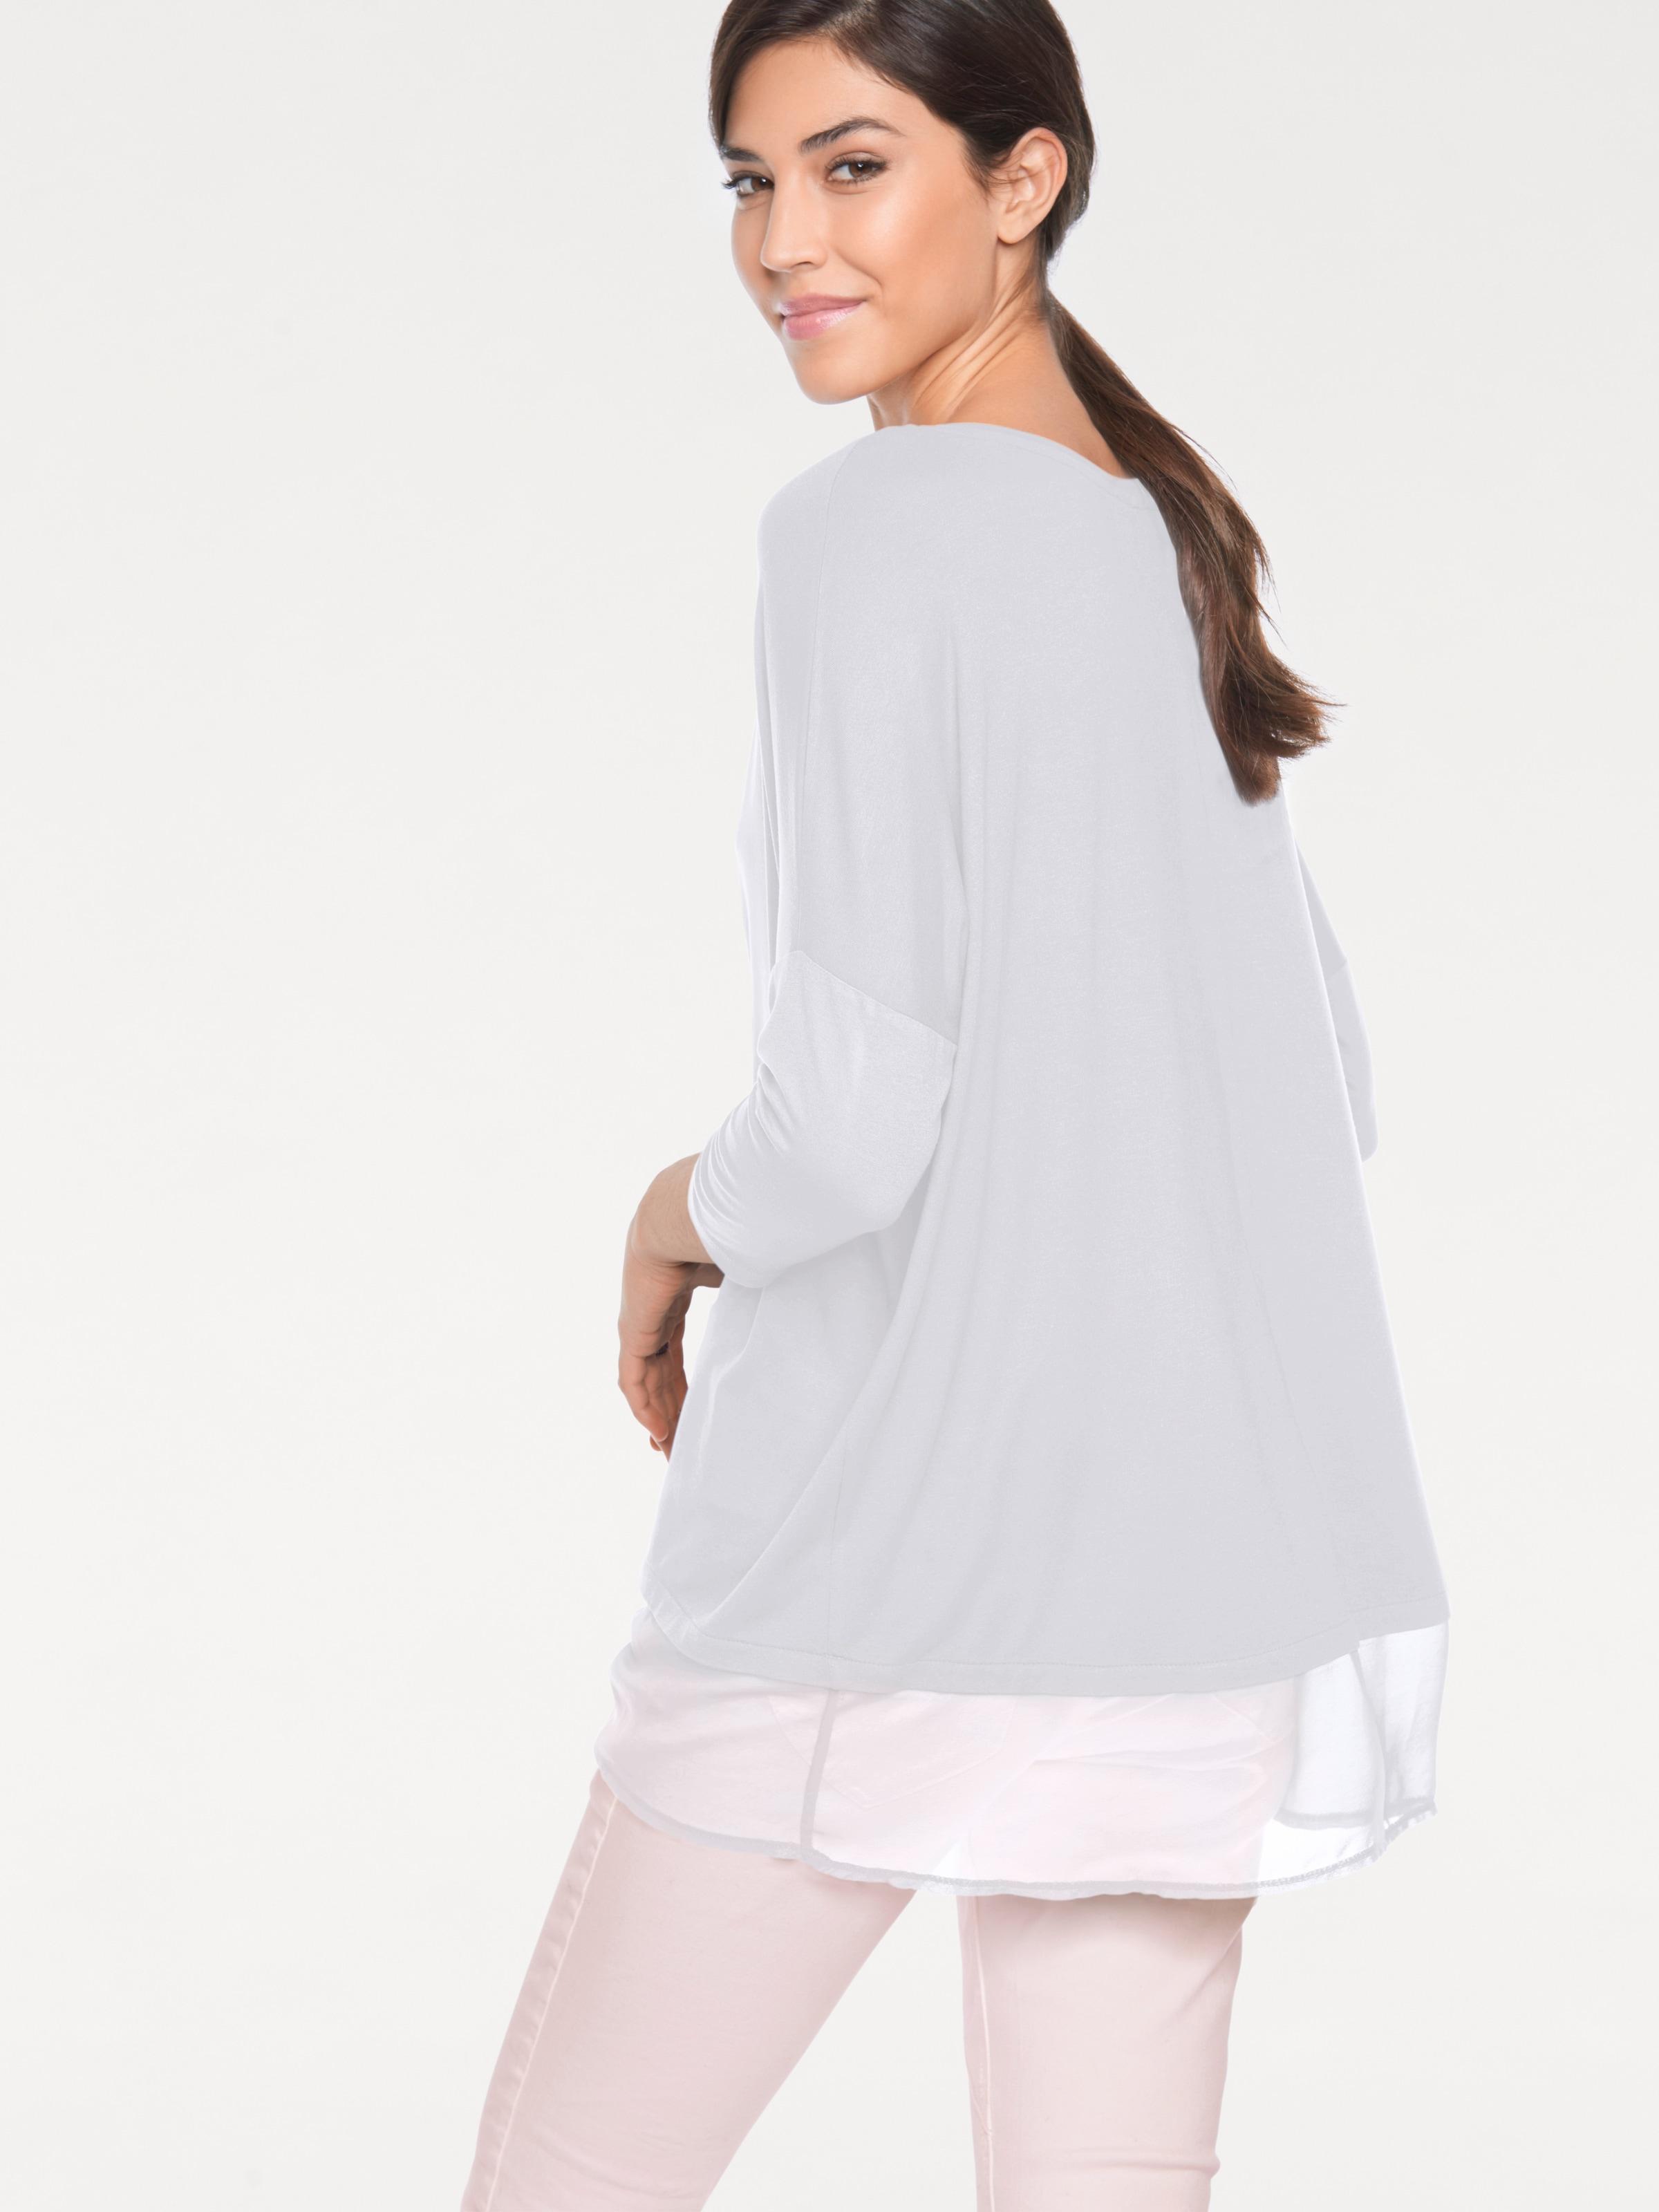 Blanc shirt shirt En En Heine Heine T Blanc T NwOmn0v8